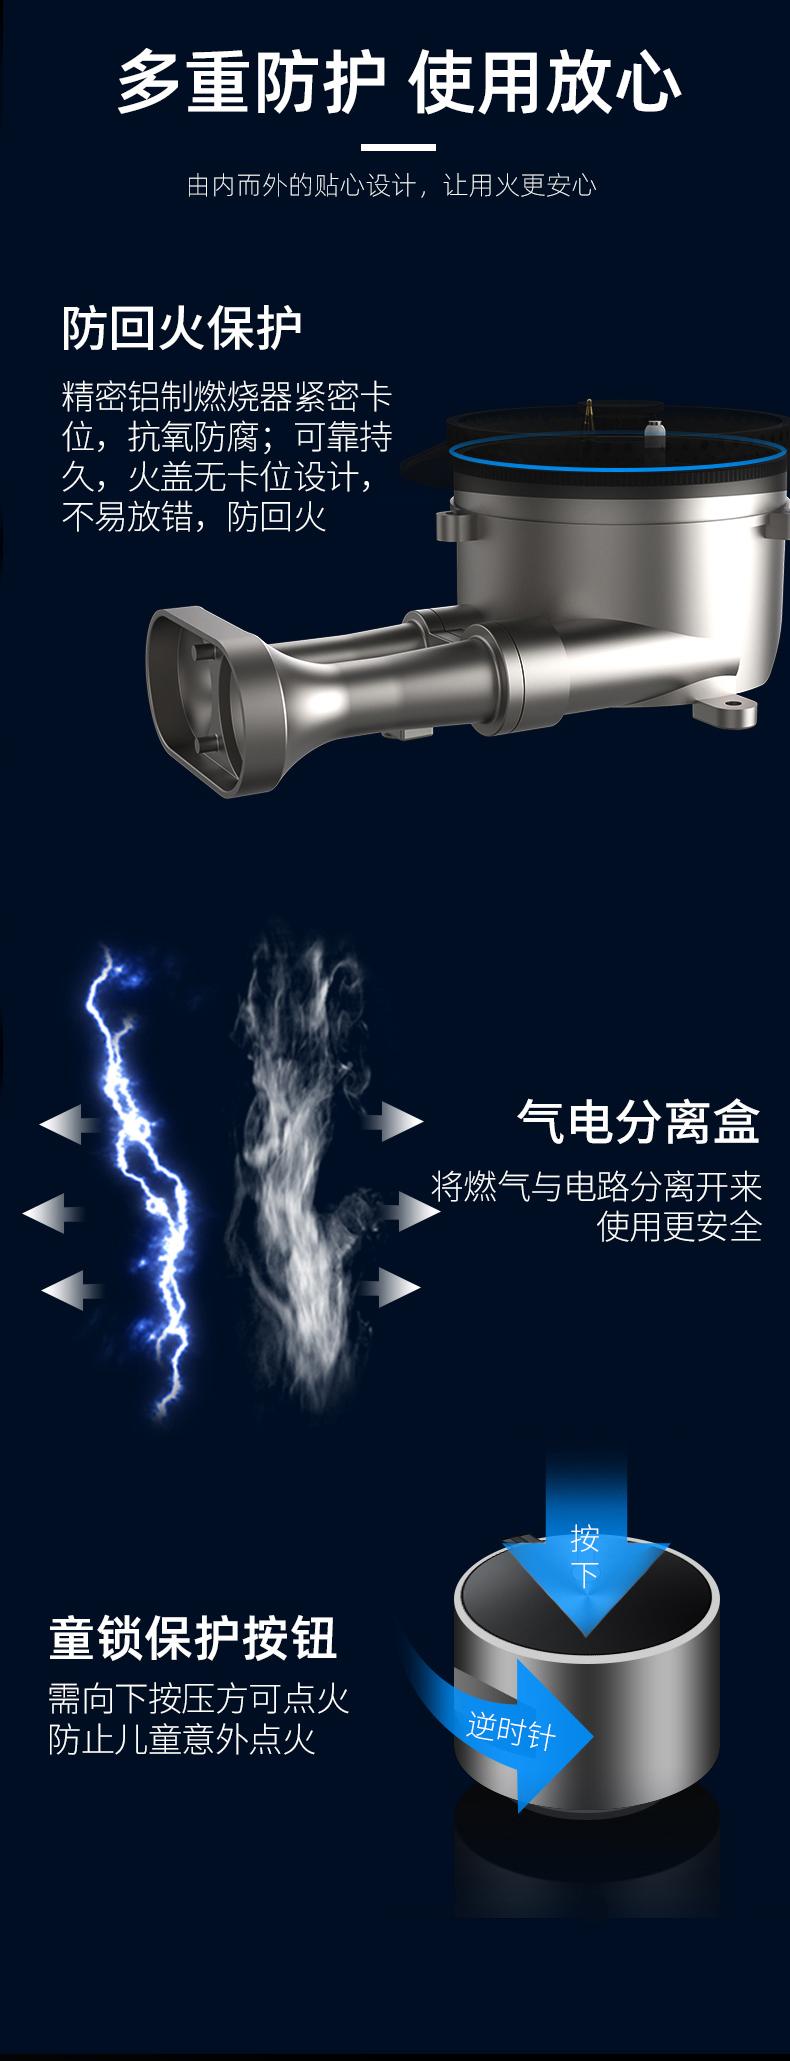 JZT-HT-A华太嵌入式天然气燃气灶QS002